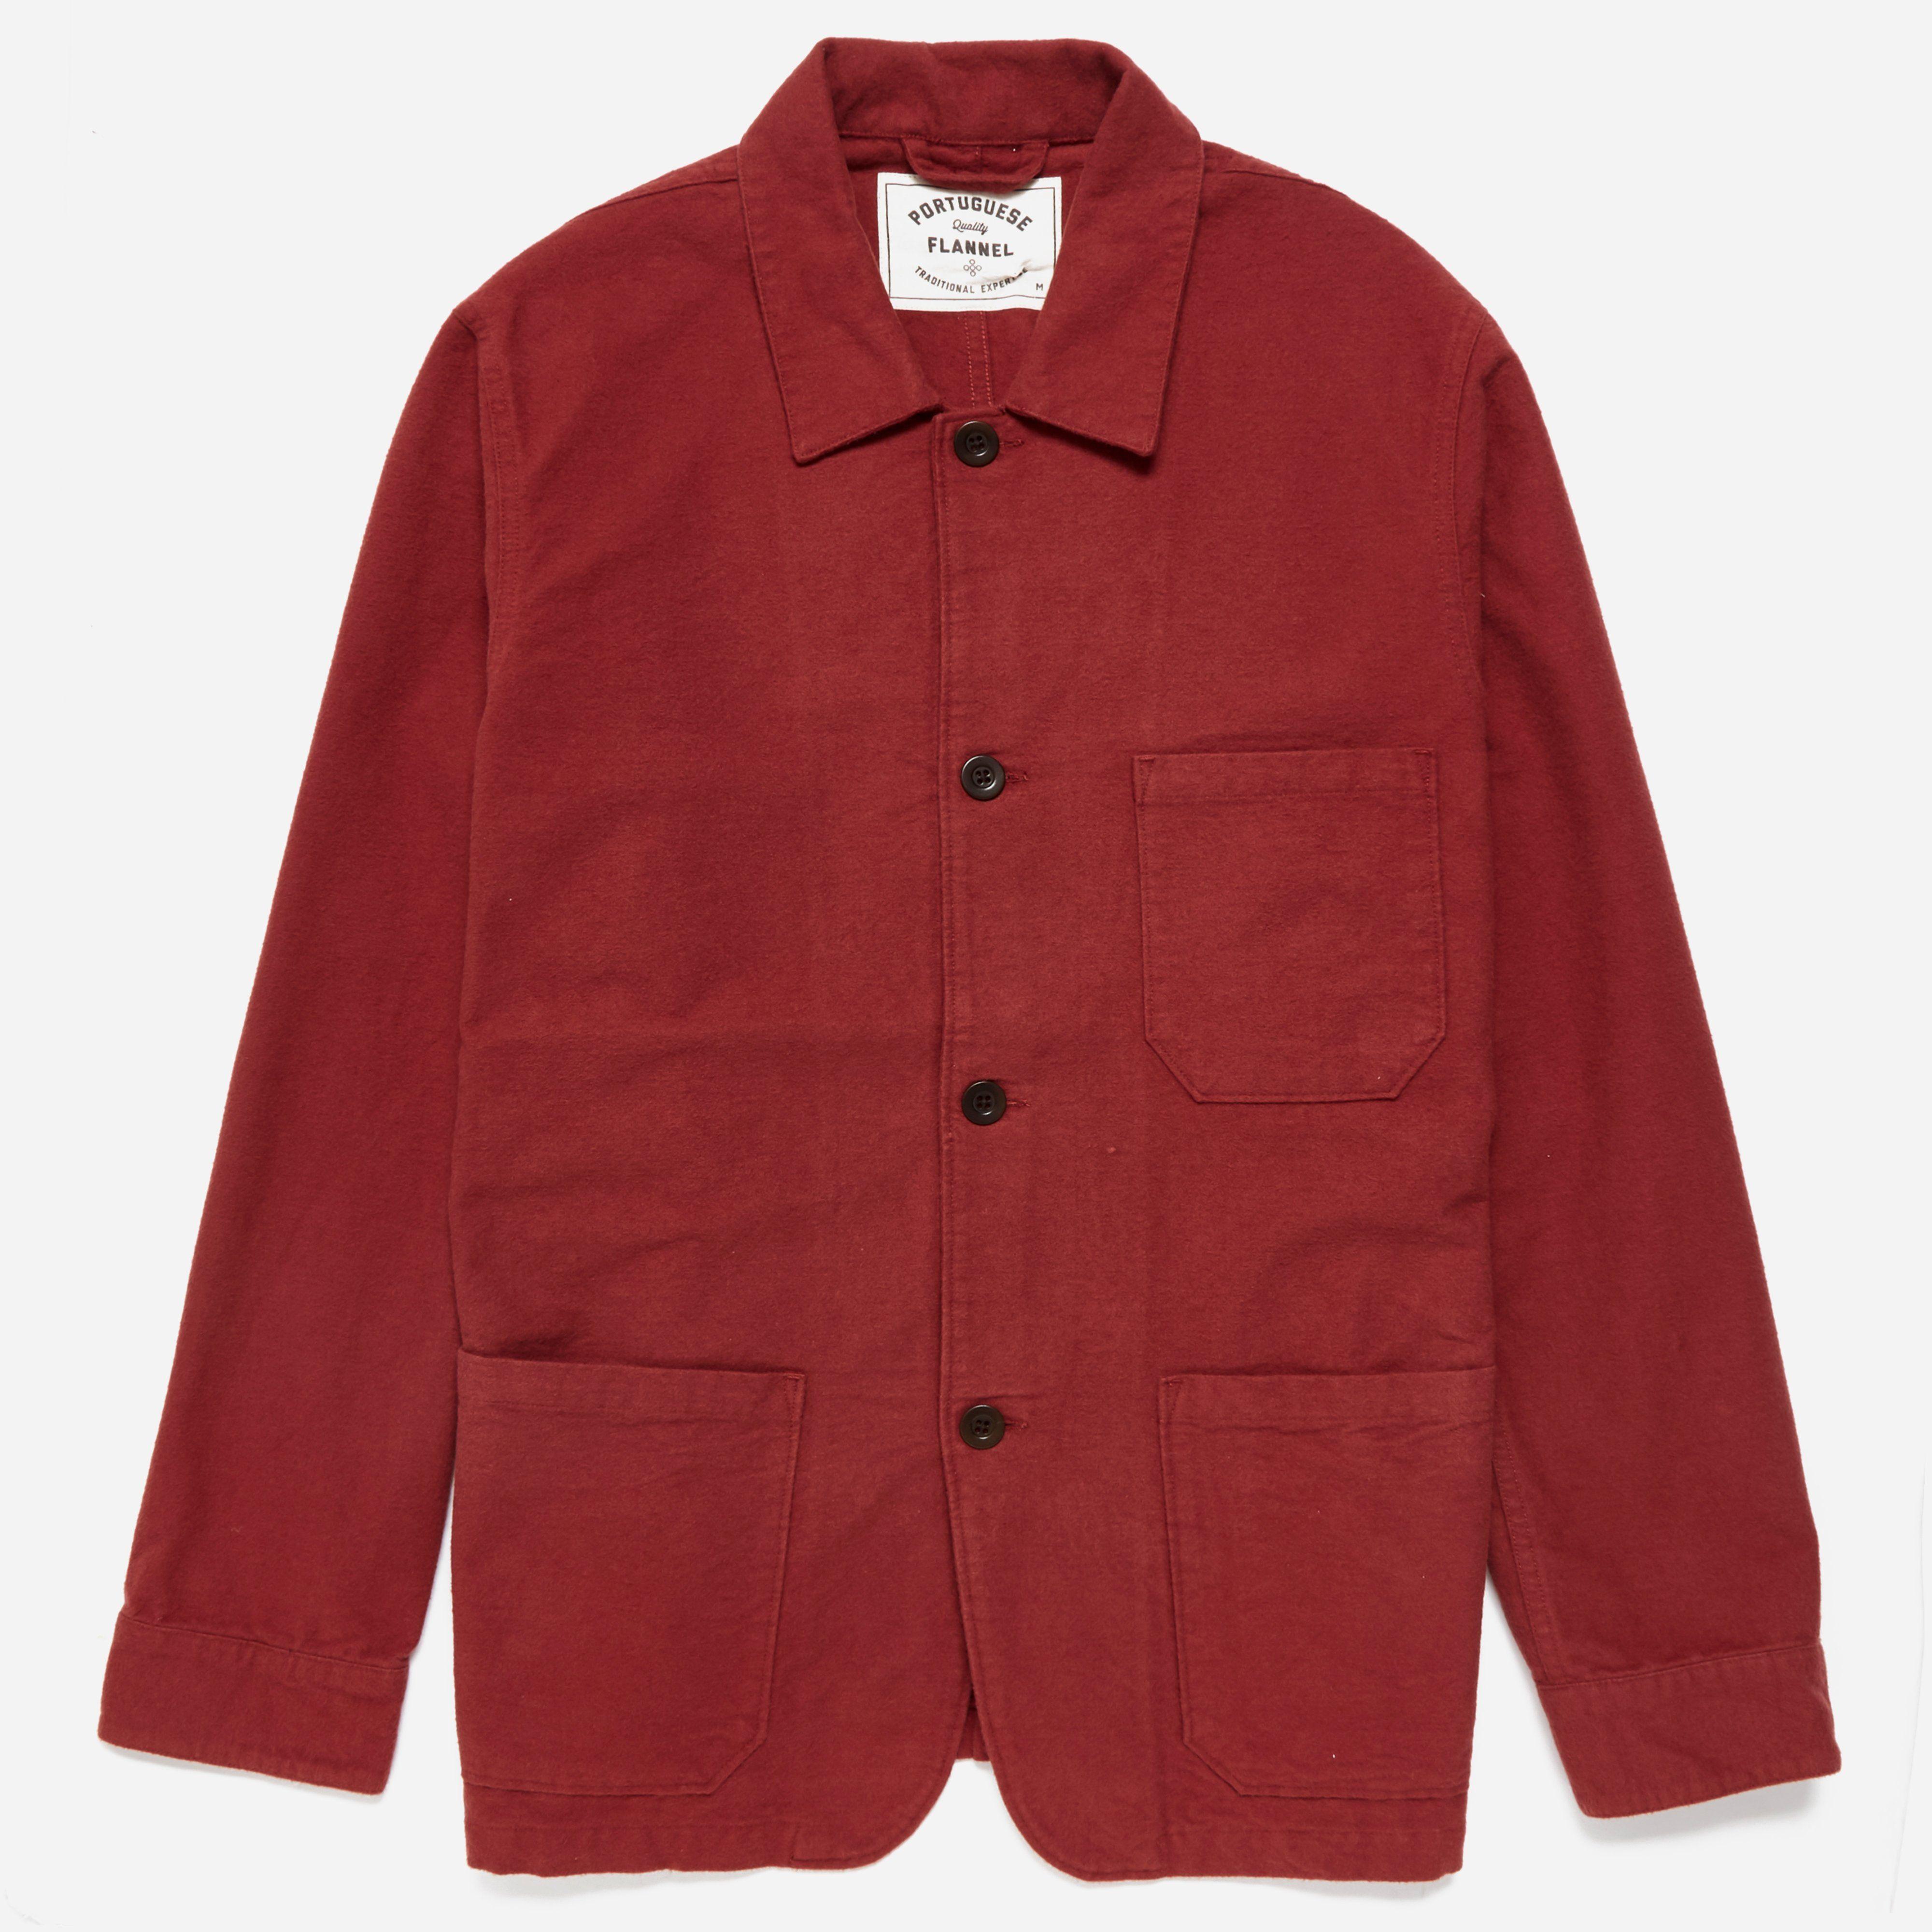 Portuguese Flannel Pinheiro Bordeaux Jacket